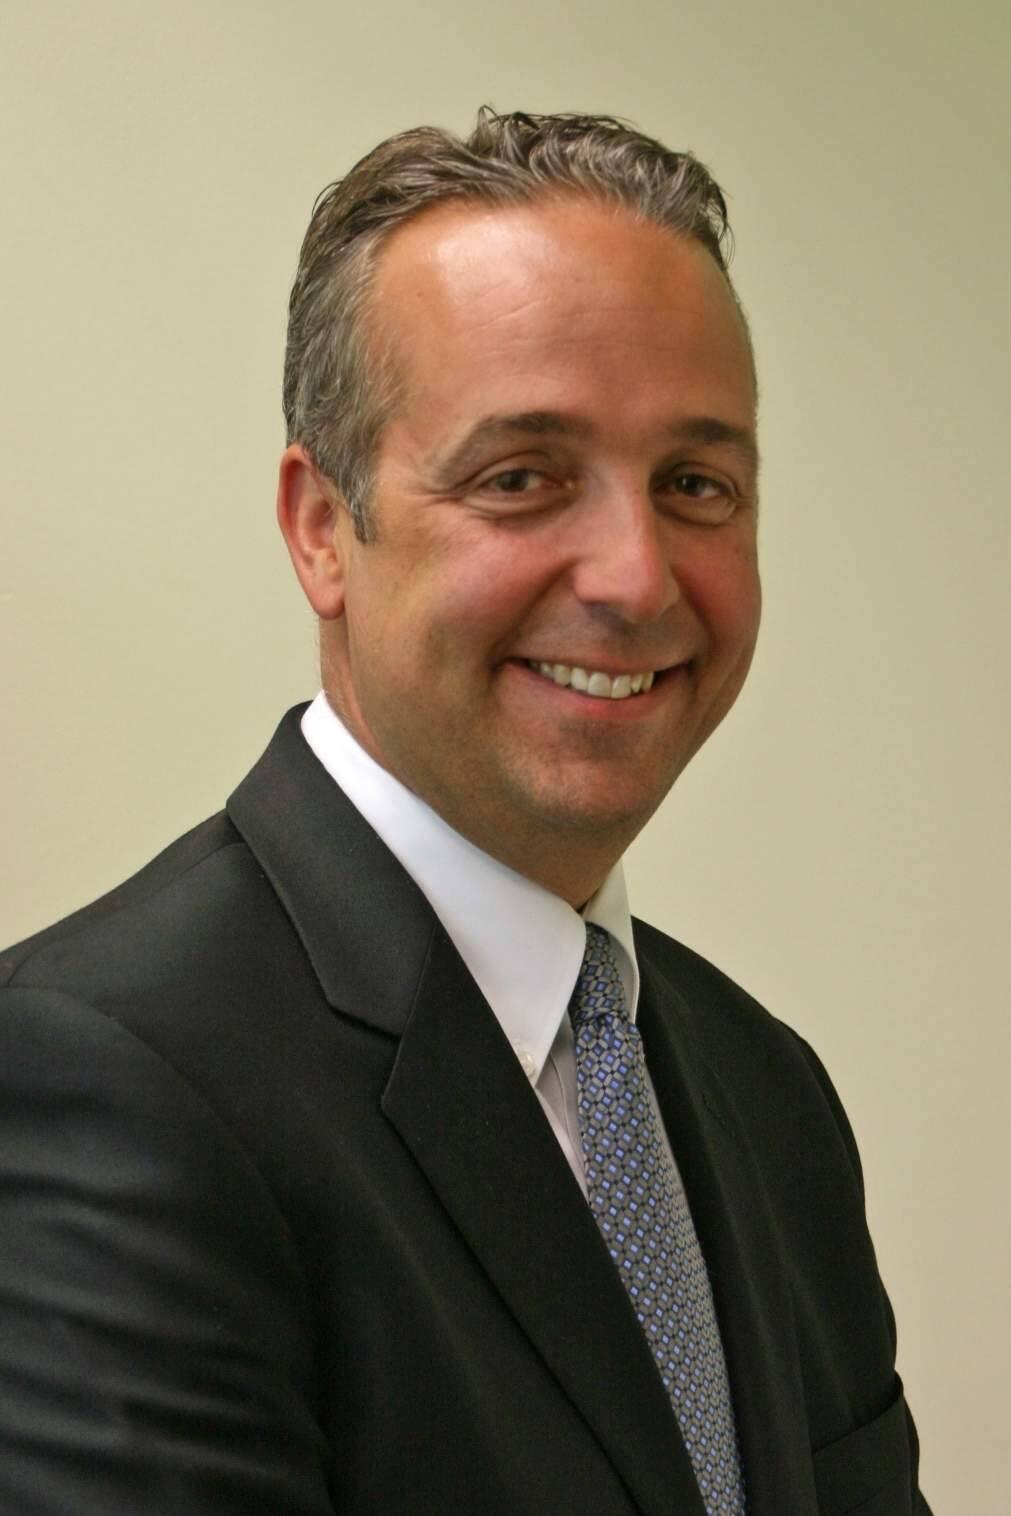 Victor McKnight, principal, EIPC Insurance Brokers